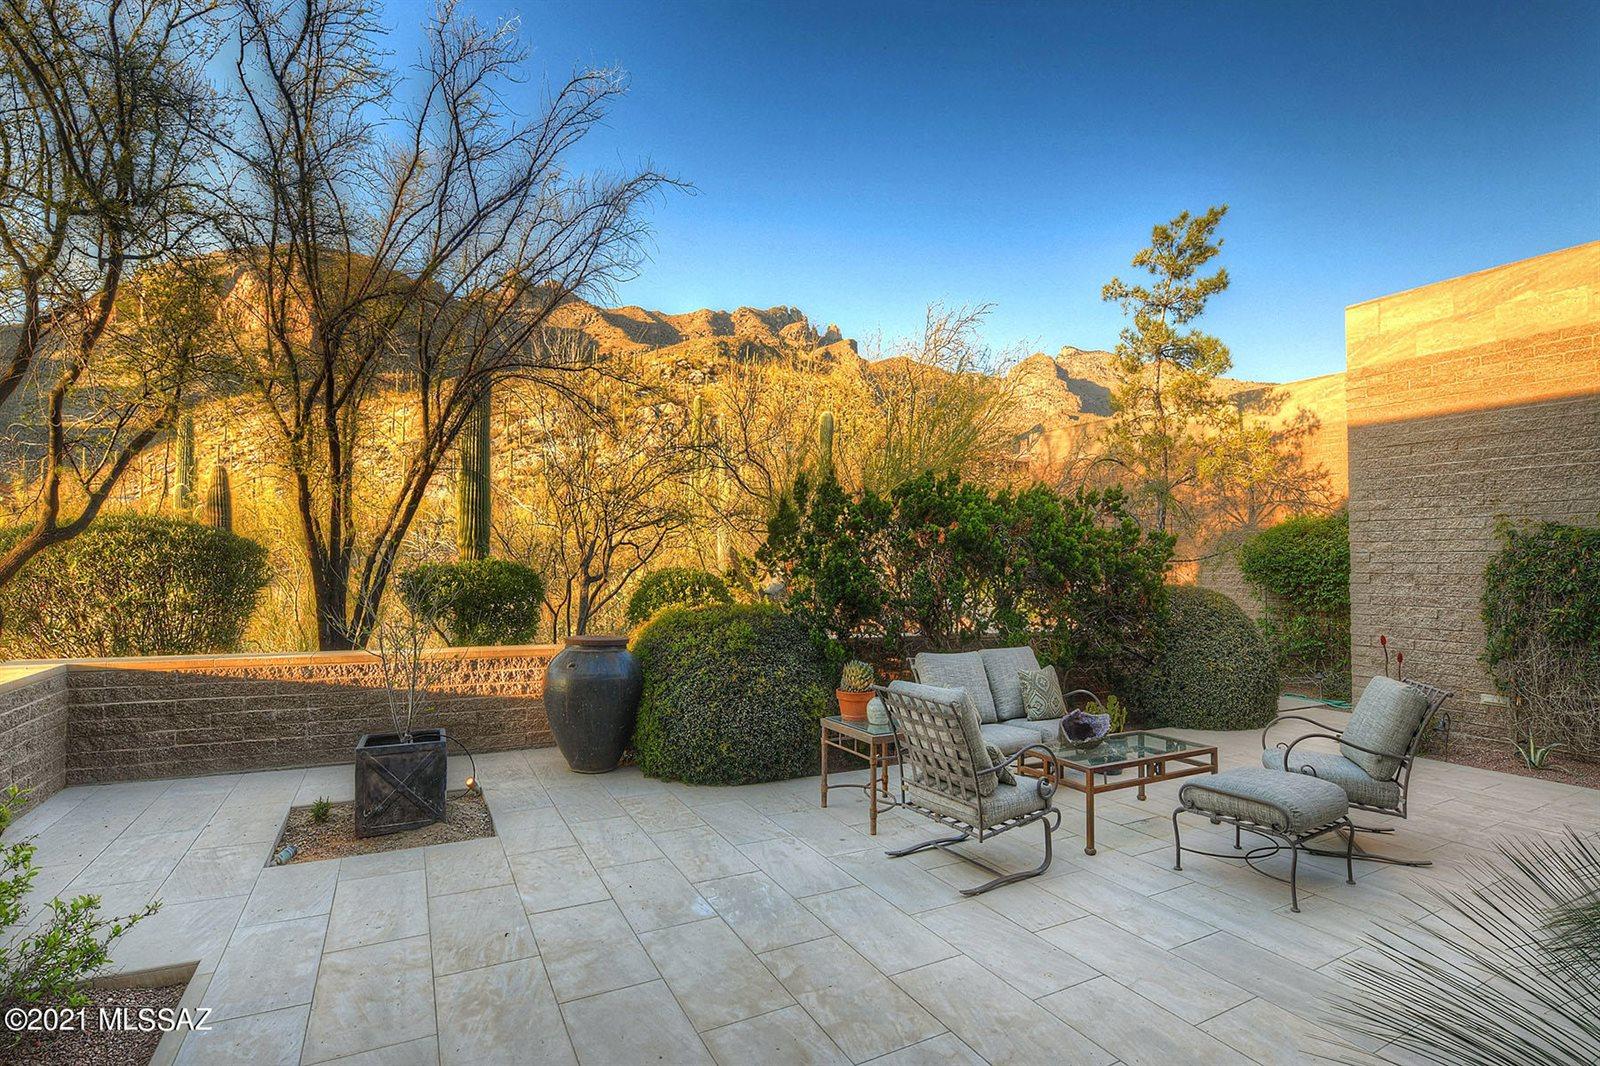 3697 East Canyon Wind Place, Tucson, AZ 85718